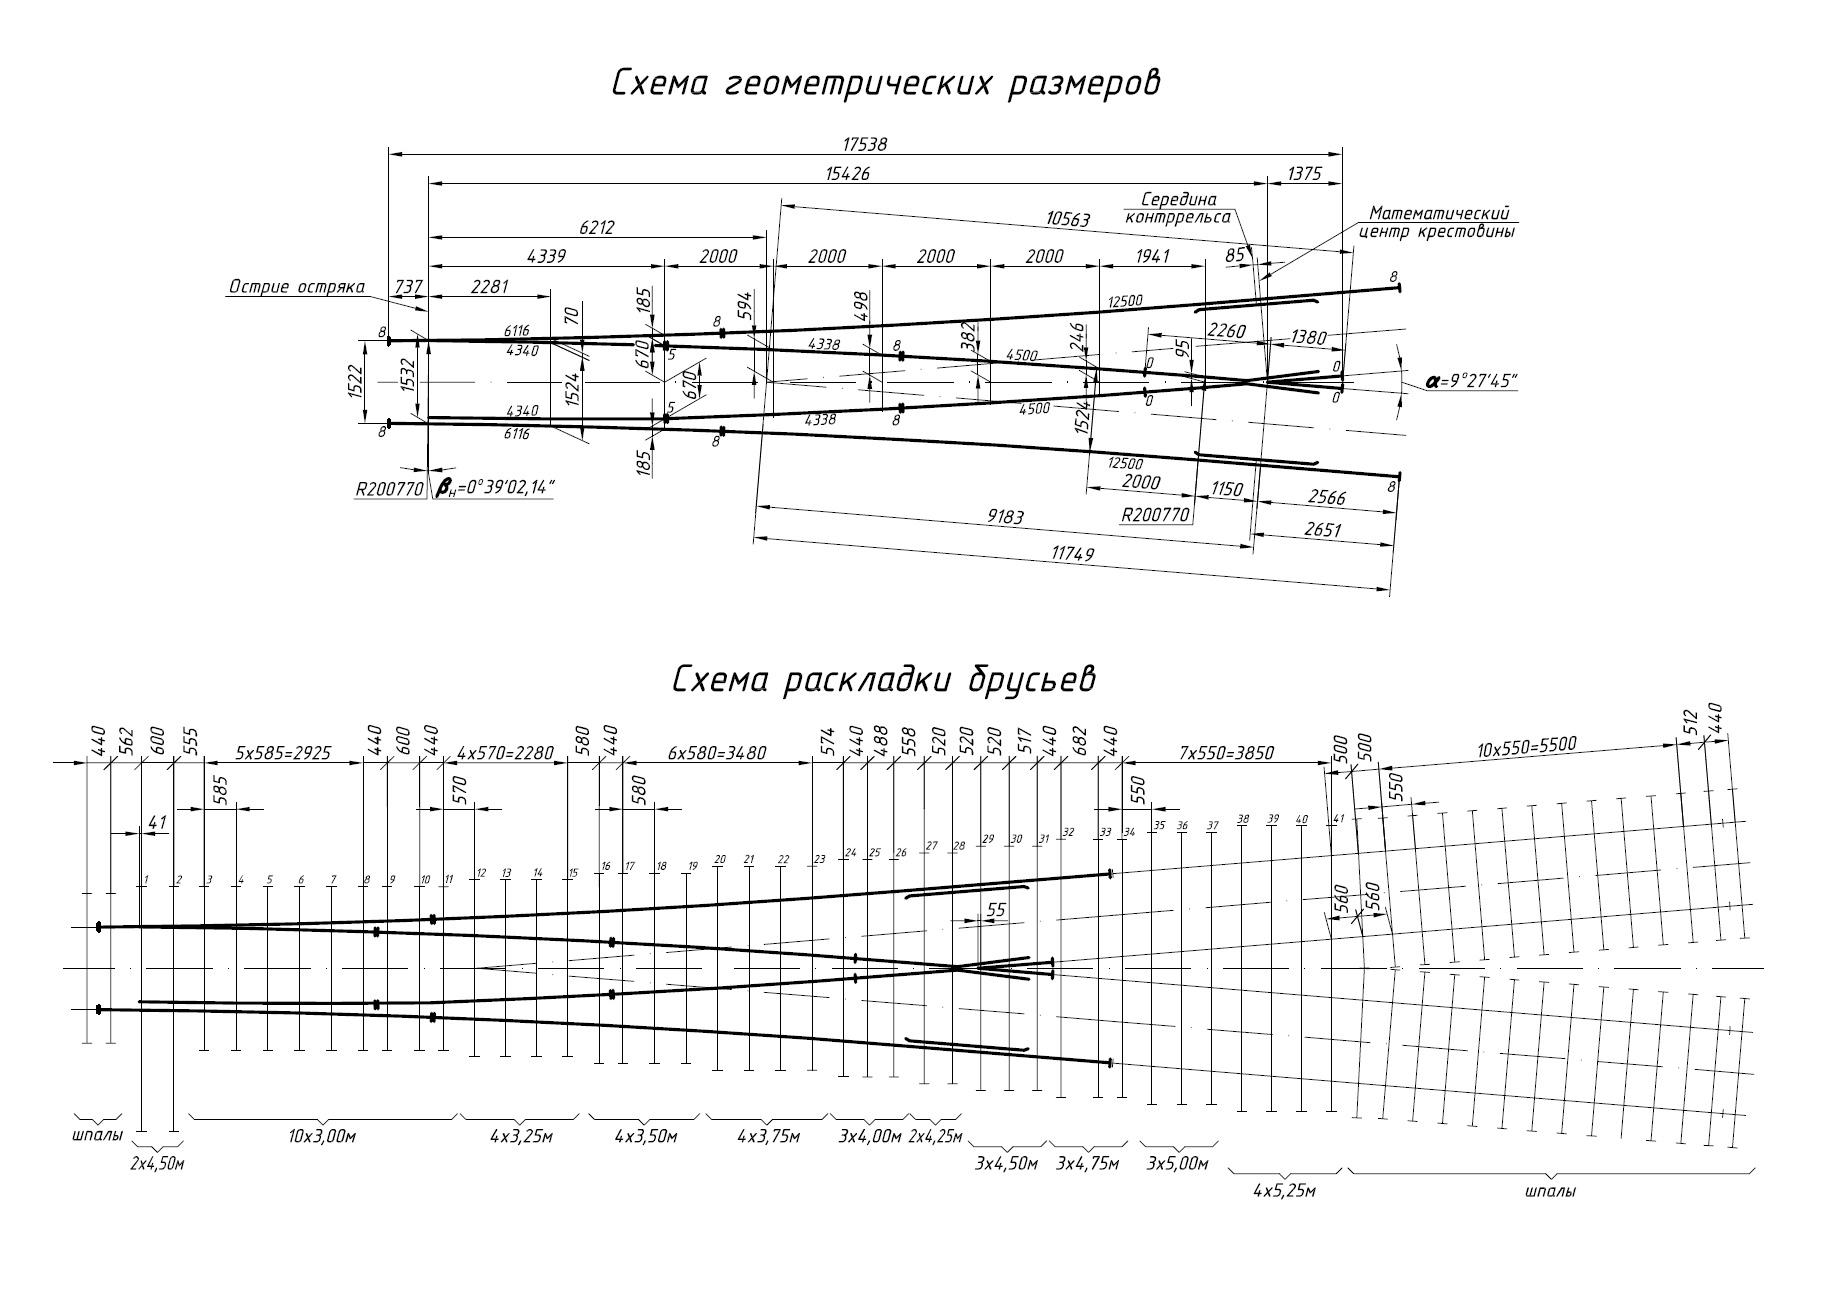 Ремкомплект Р50 1/6 резерв - фото 2